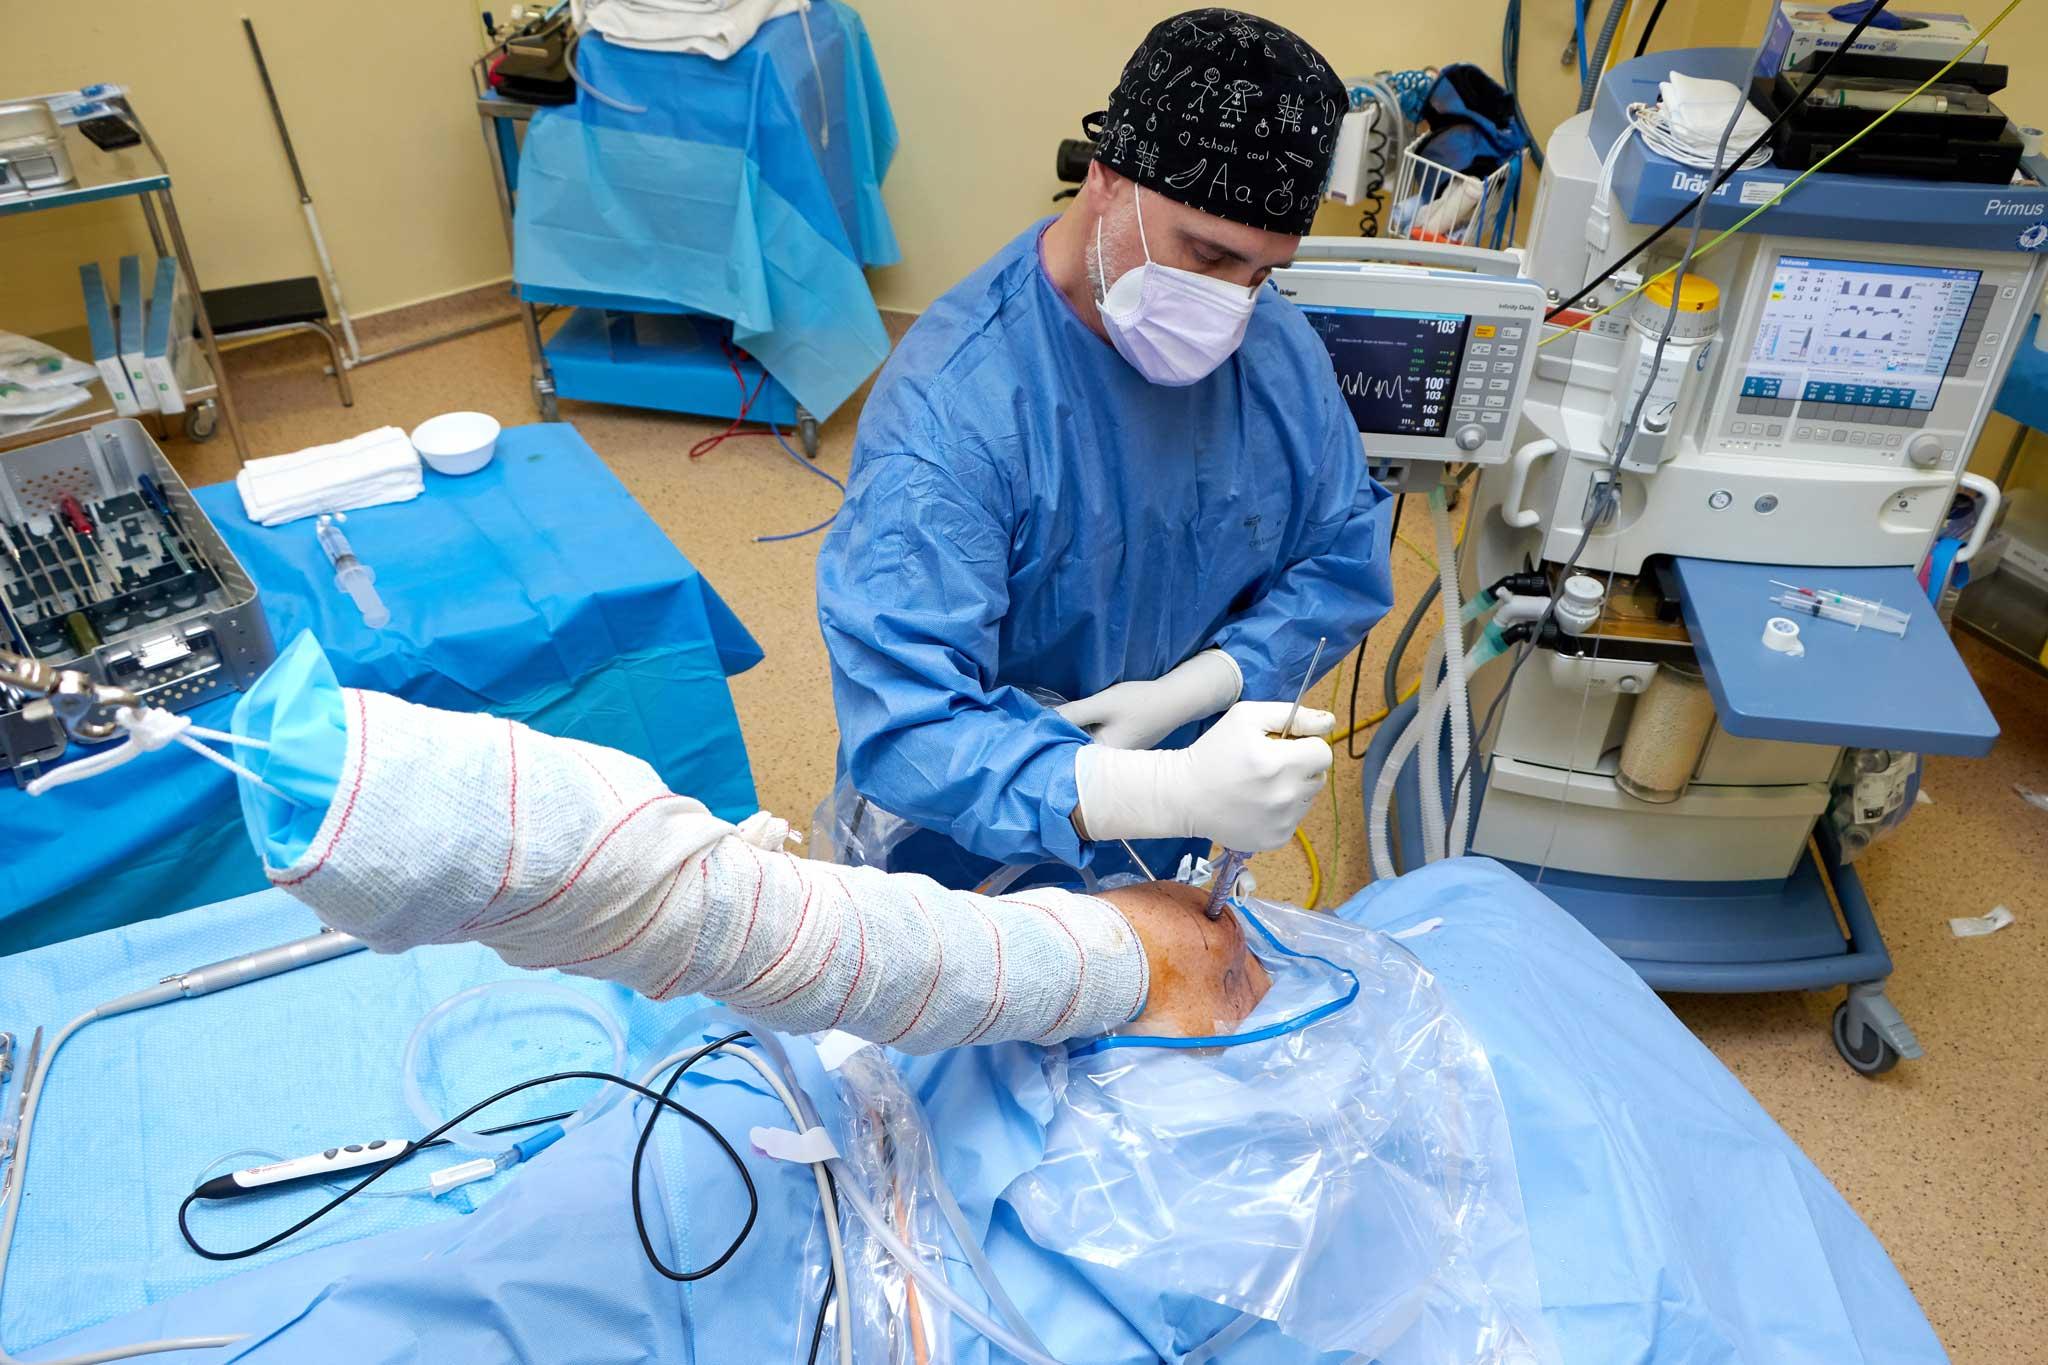 Profesionales de traumatología e implantología dental